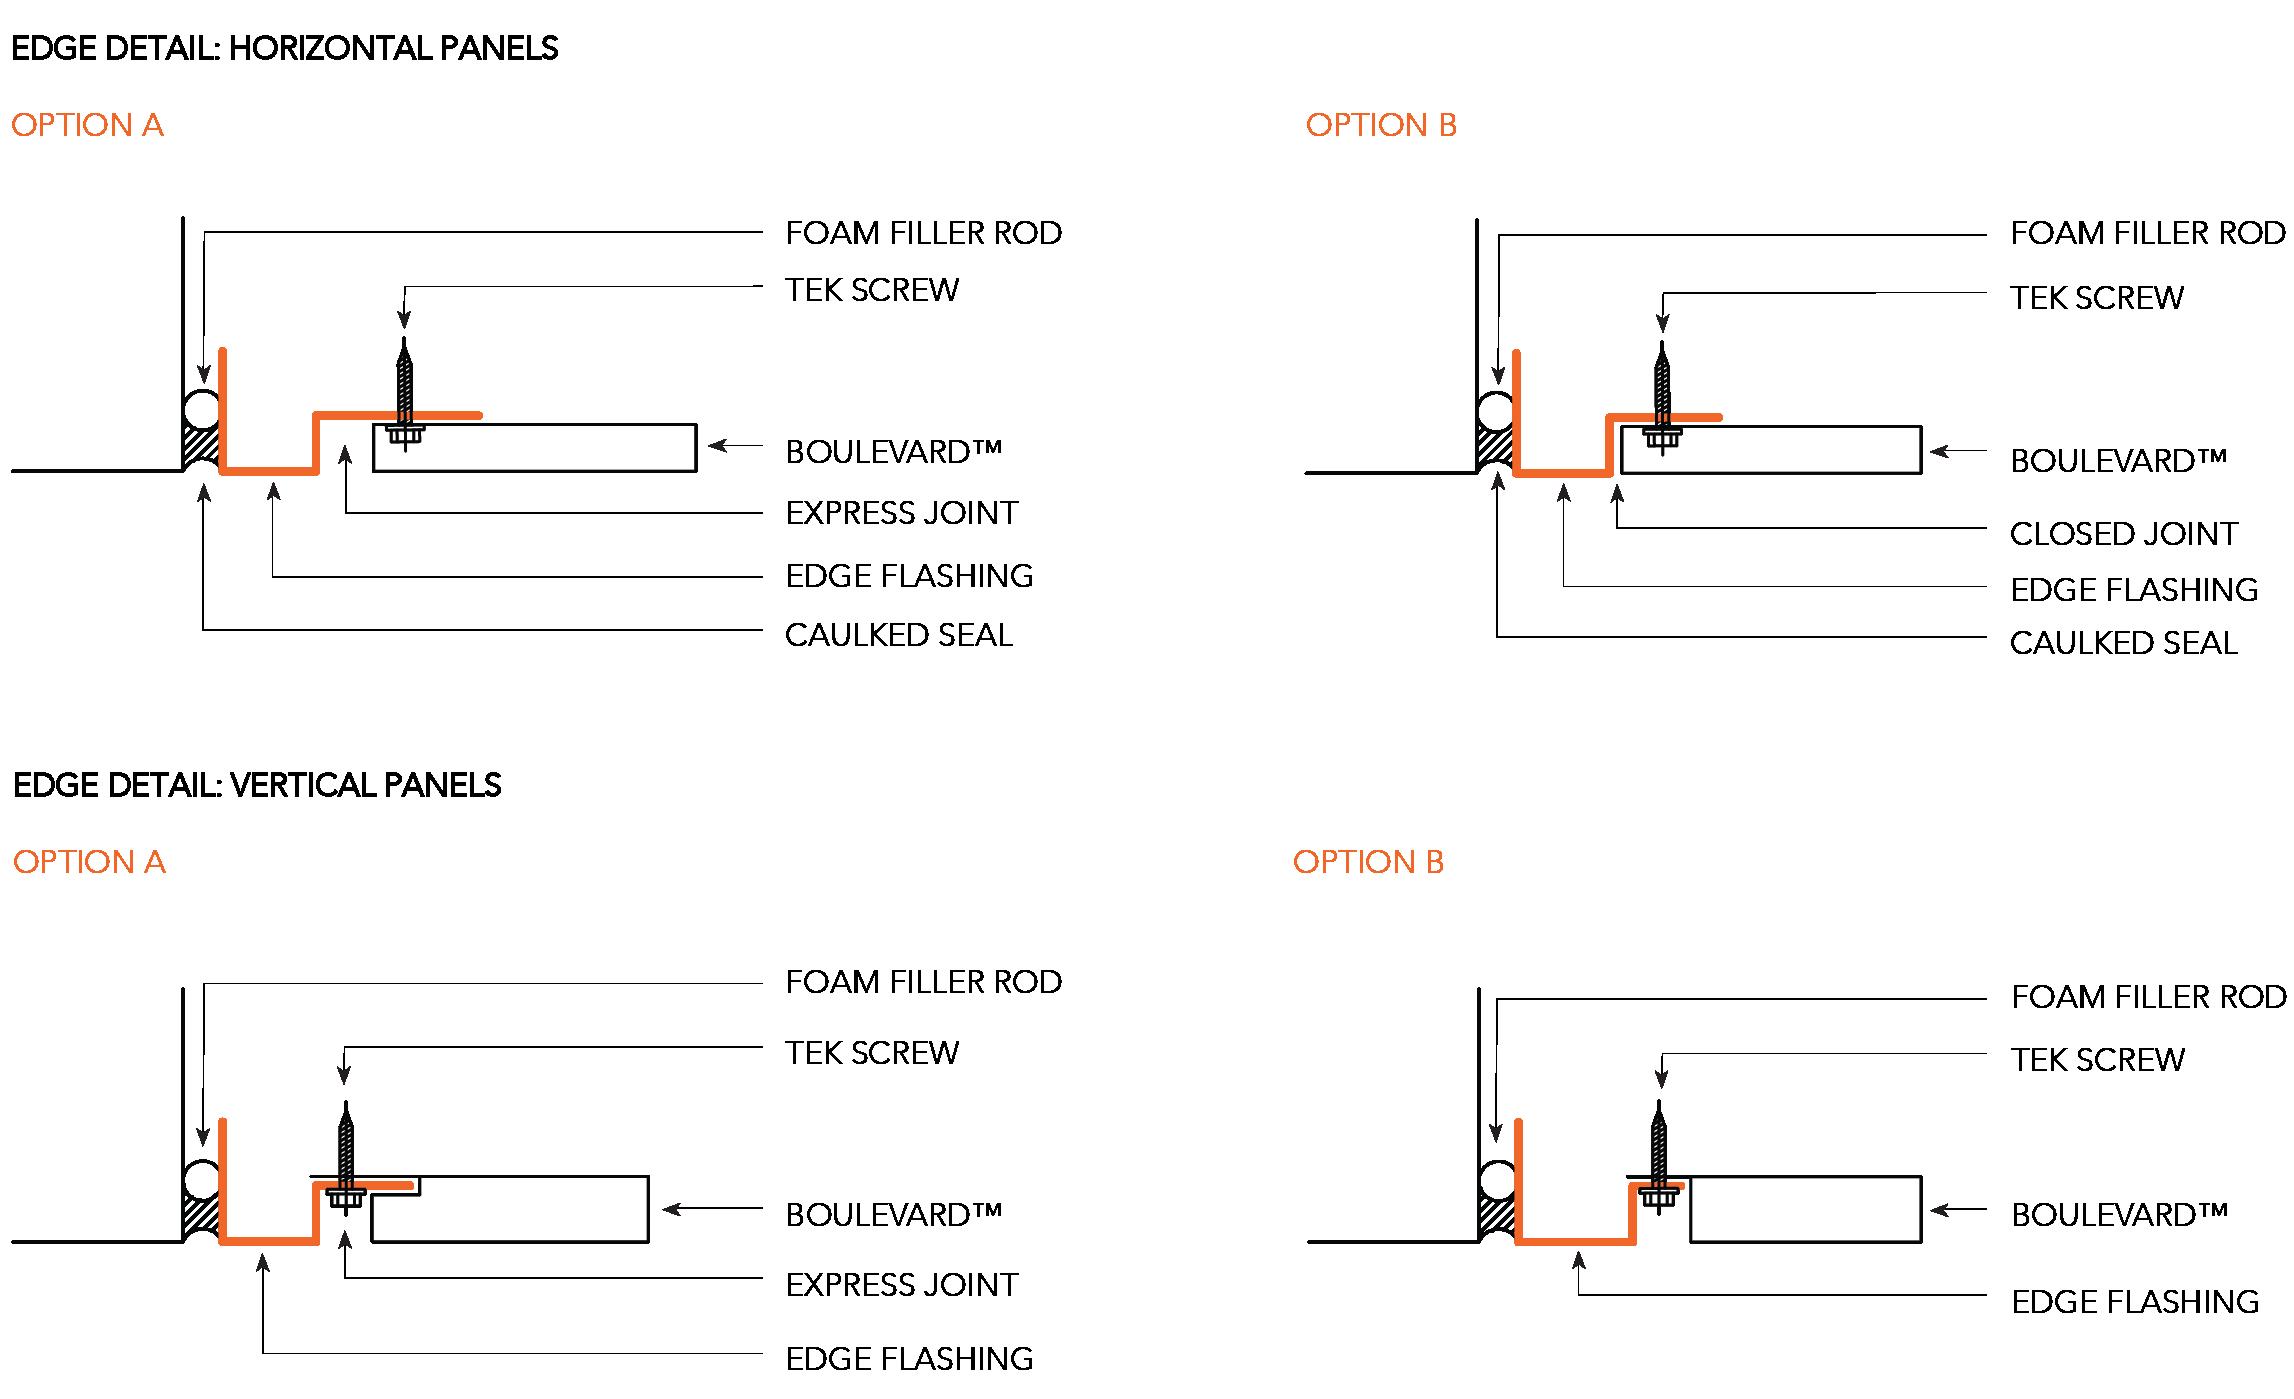 BOULEVARD™ NON-CYCLONIC Installation Details Edge Detail - Horizontal Panels & Vertical Panels Figure BL ID NC 022